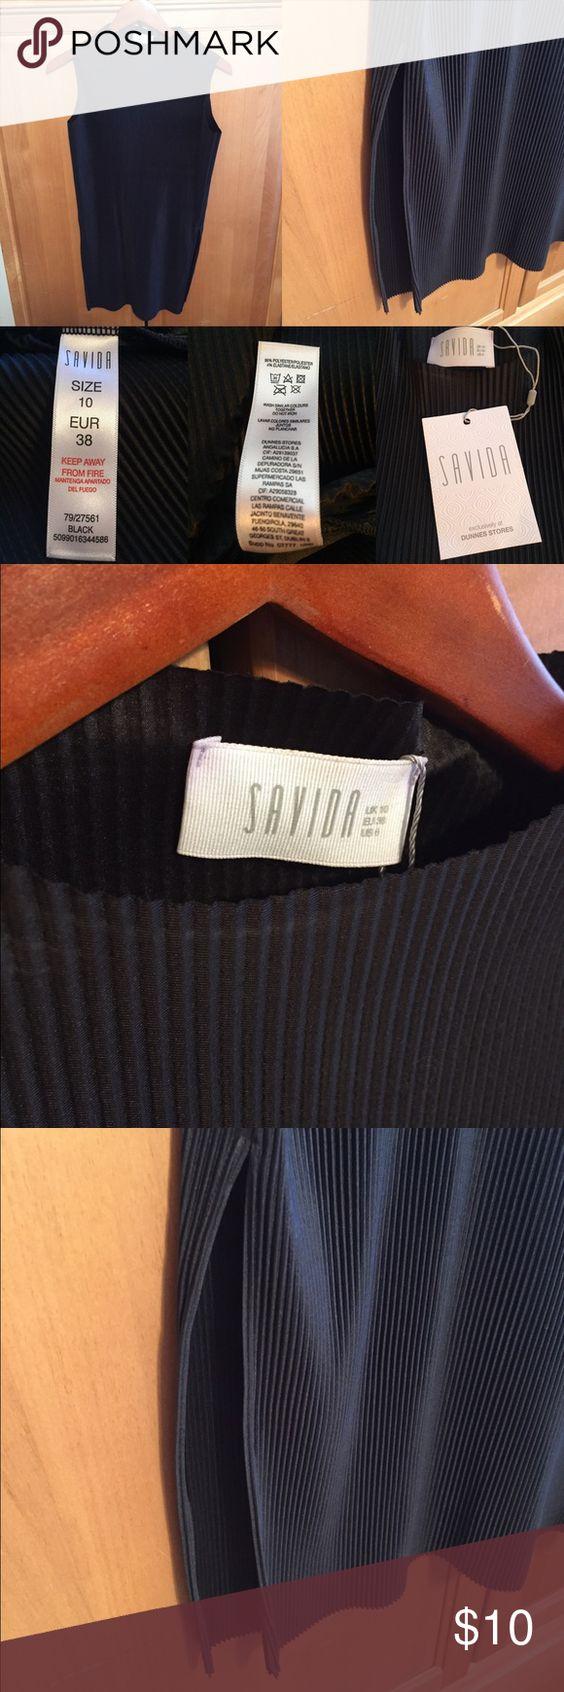 Black Savida pleated tunic length top - size 10 Size 10 black tunic length top by Savida Savida Tops Tank Tops